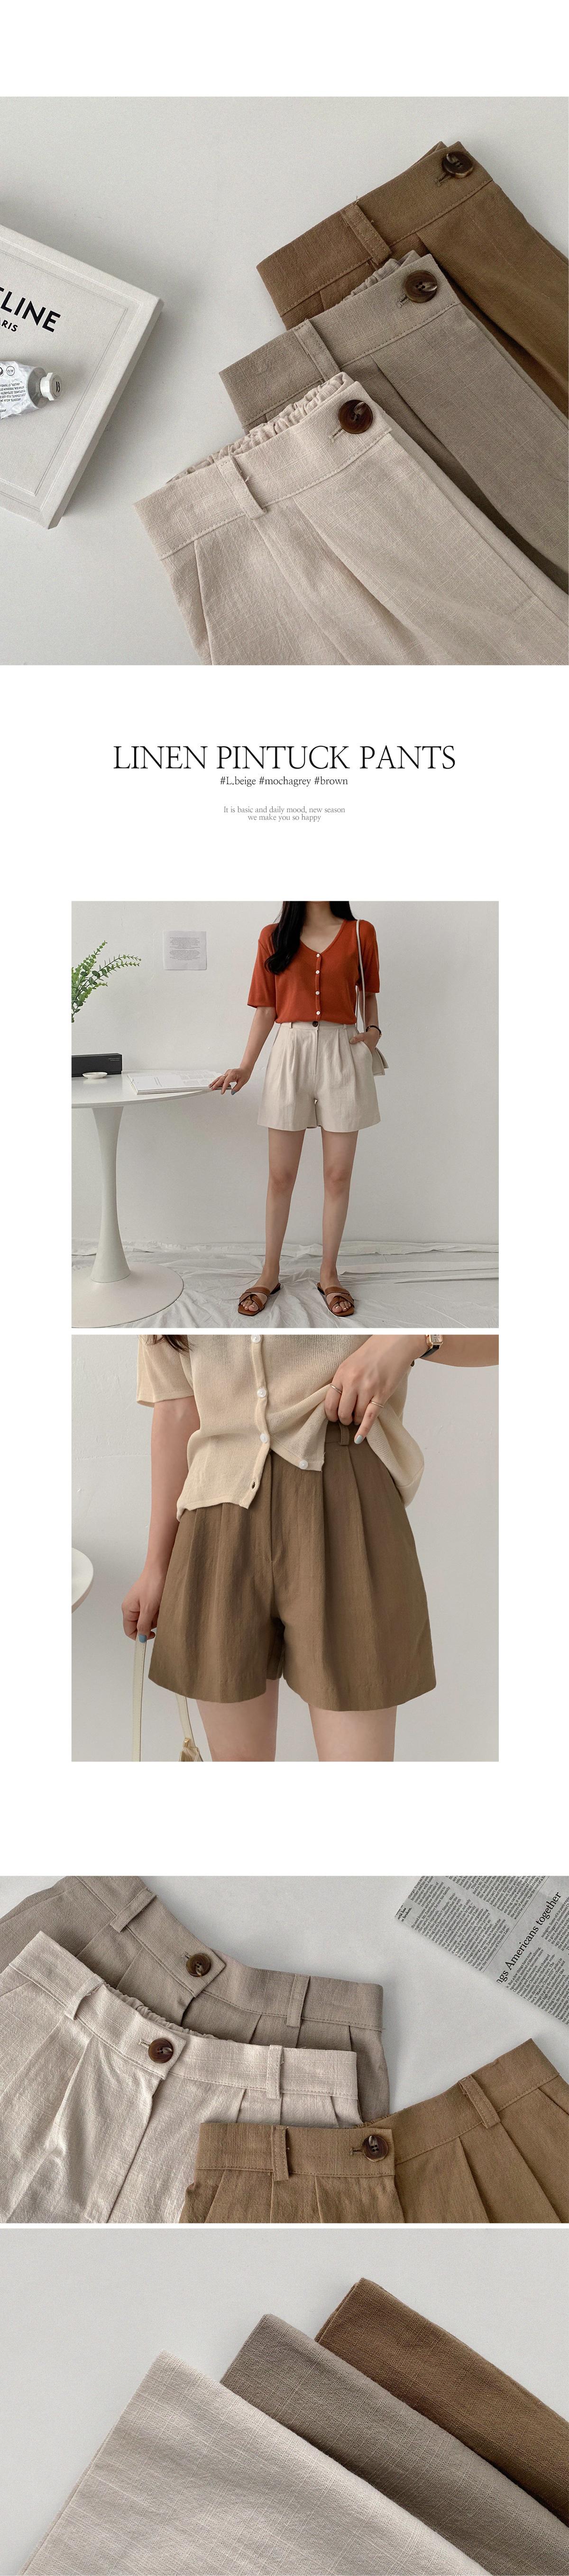 Goslin linen chin half shorts